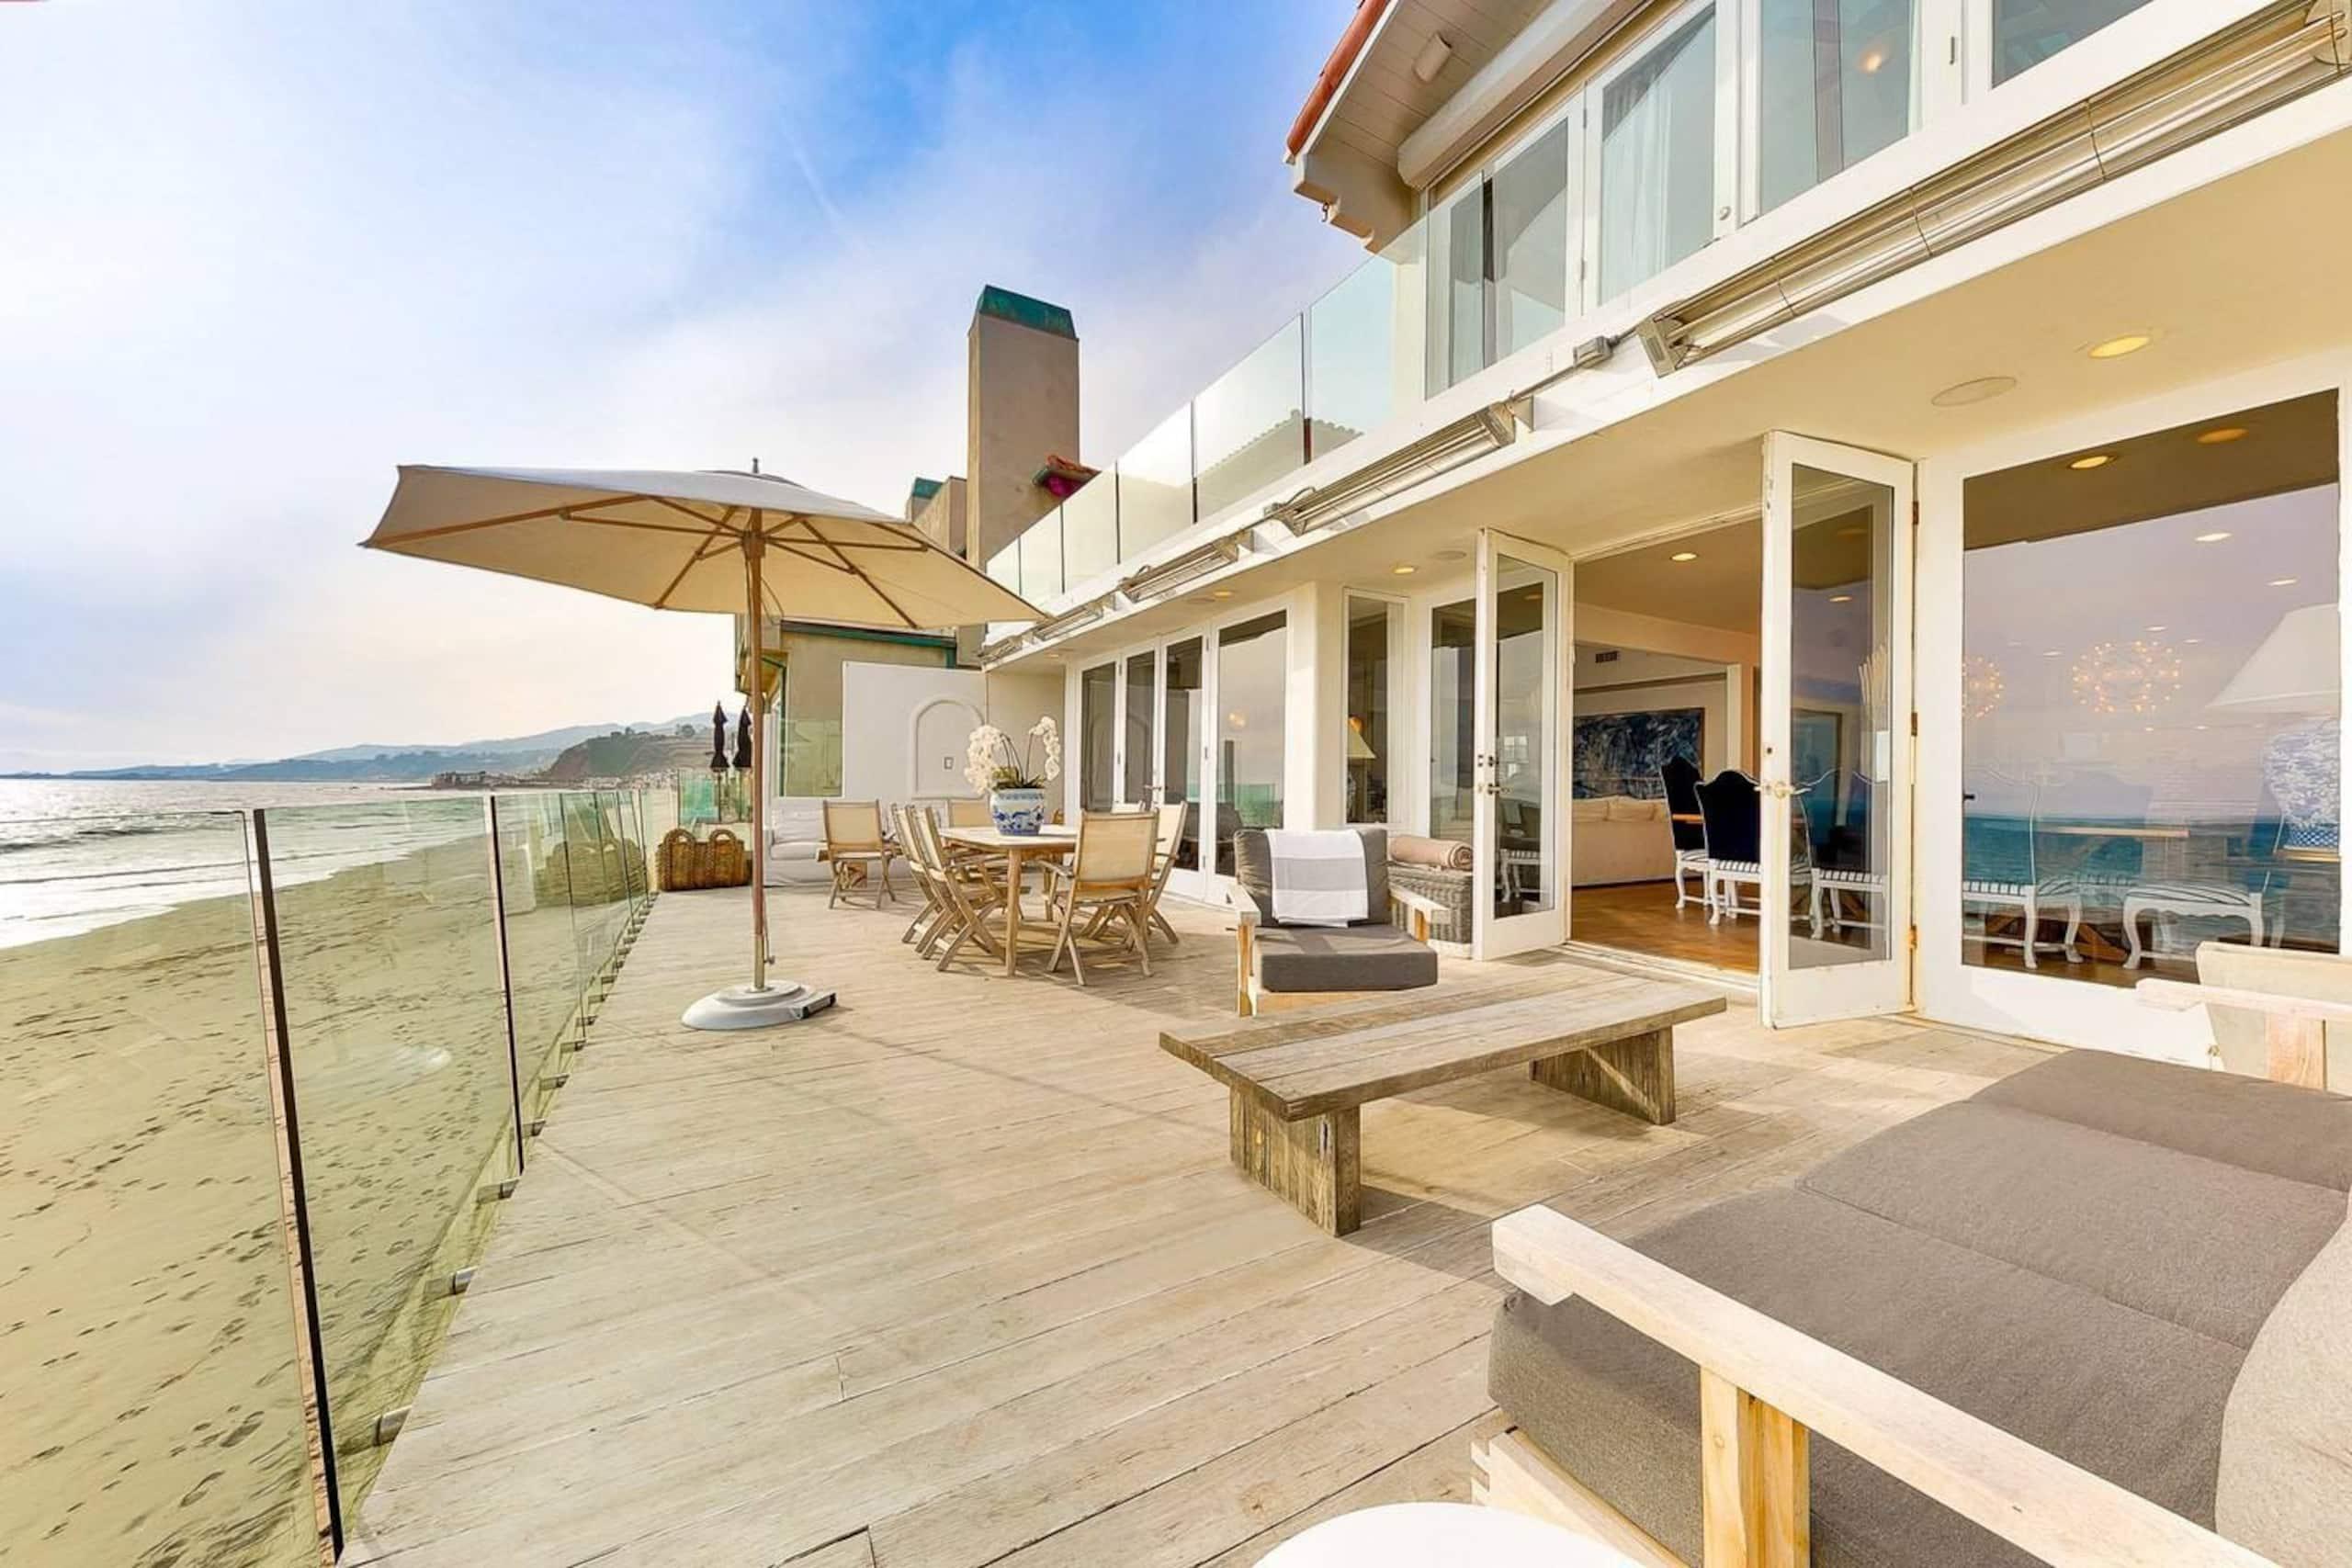 Apartment Villa Shawaiz - Beachfront Villa with 5 beds  photo 20178503